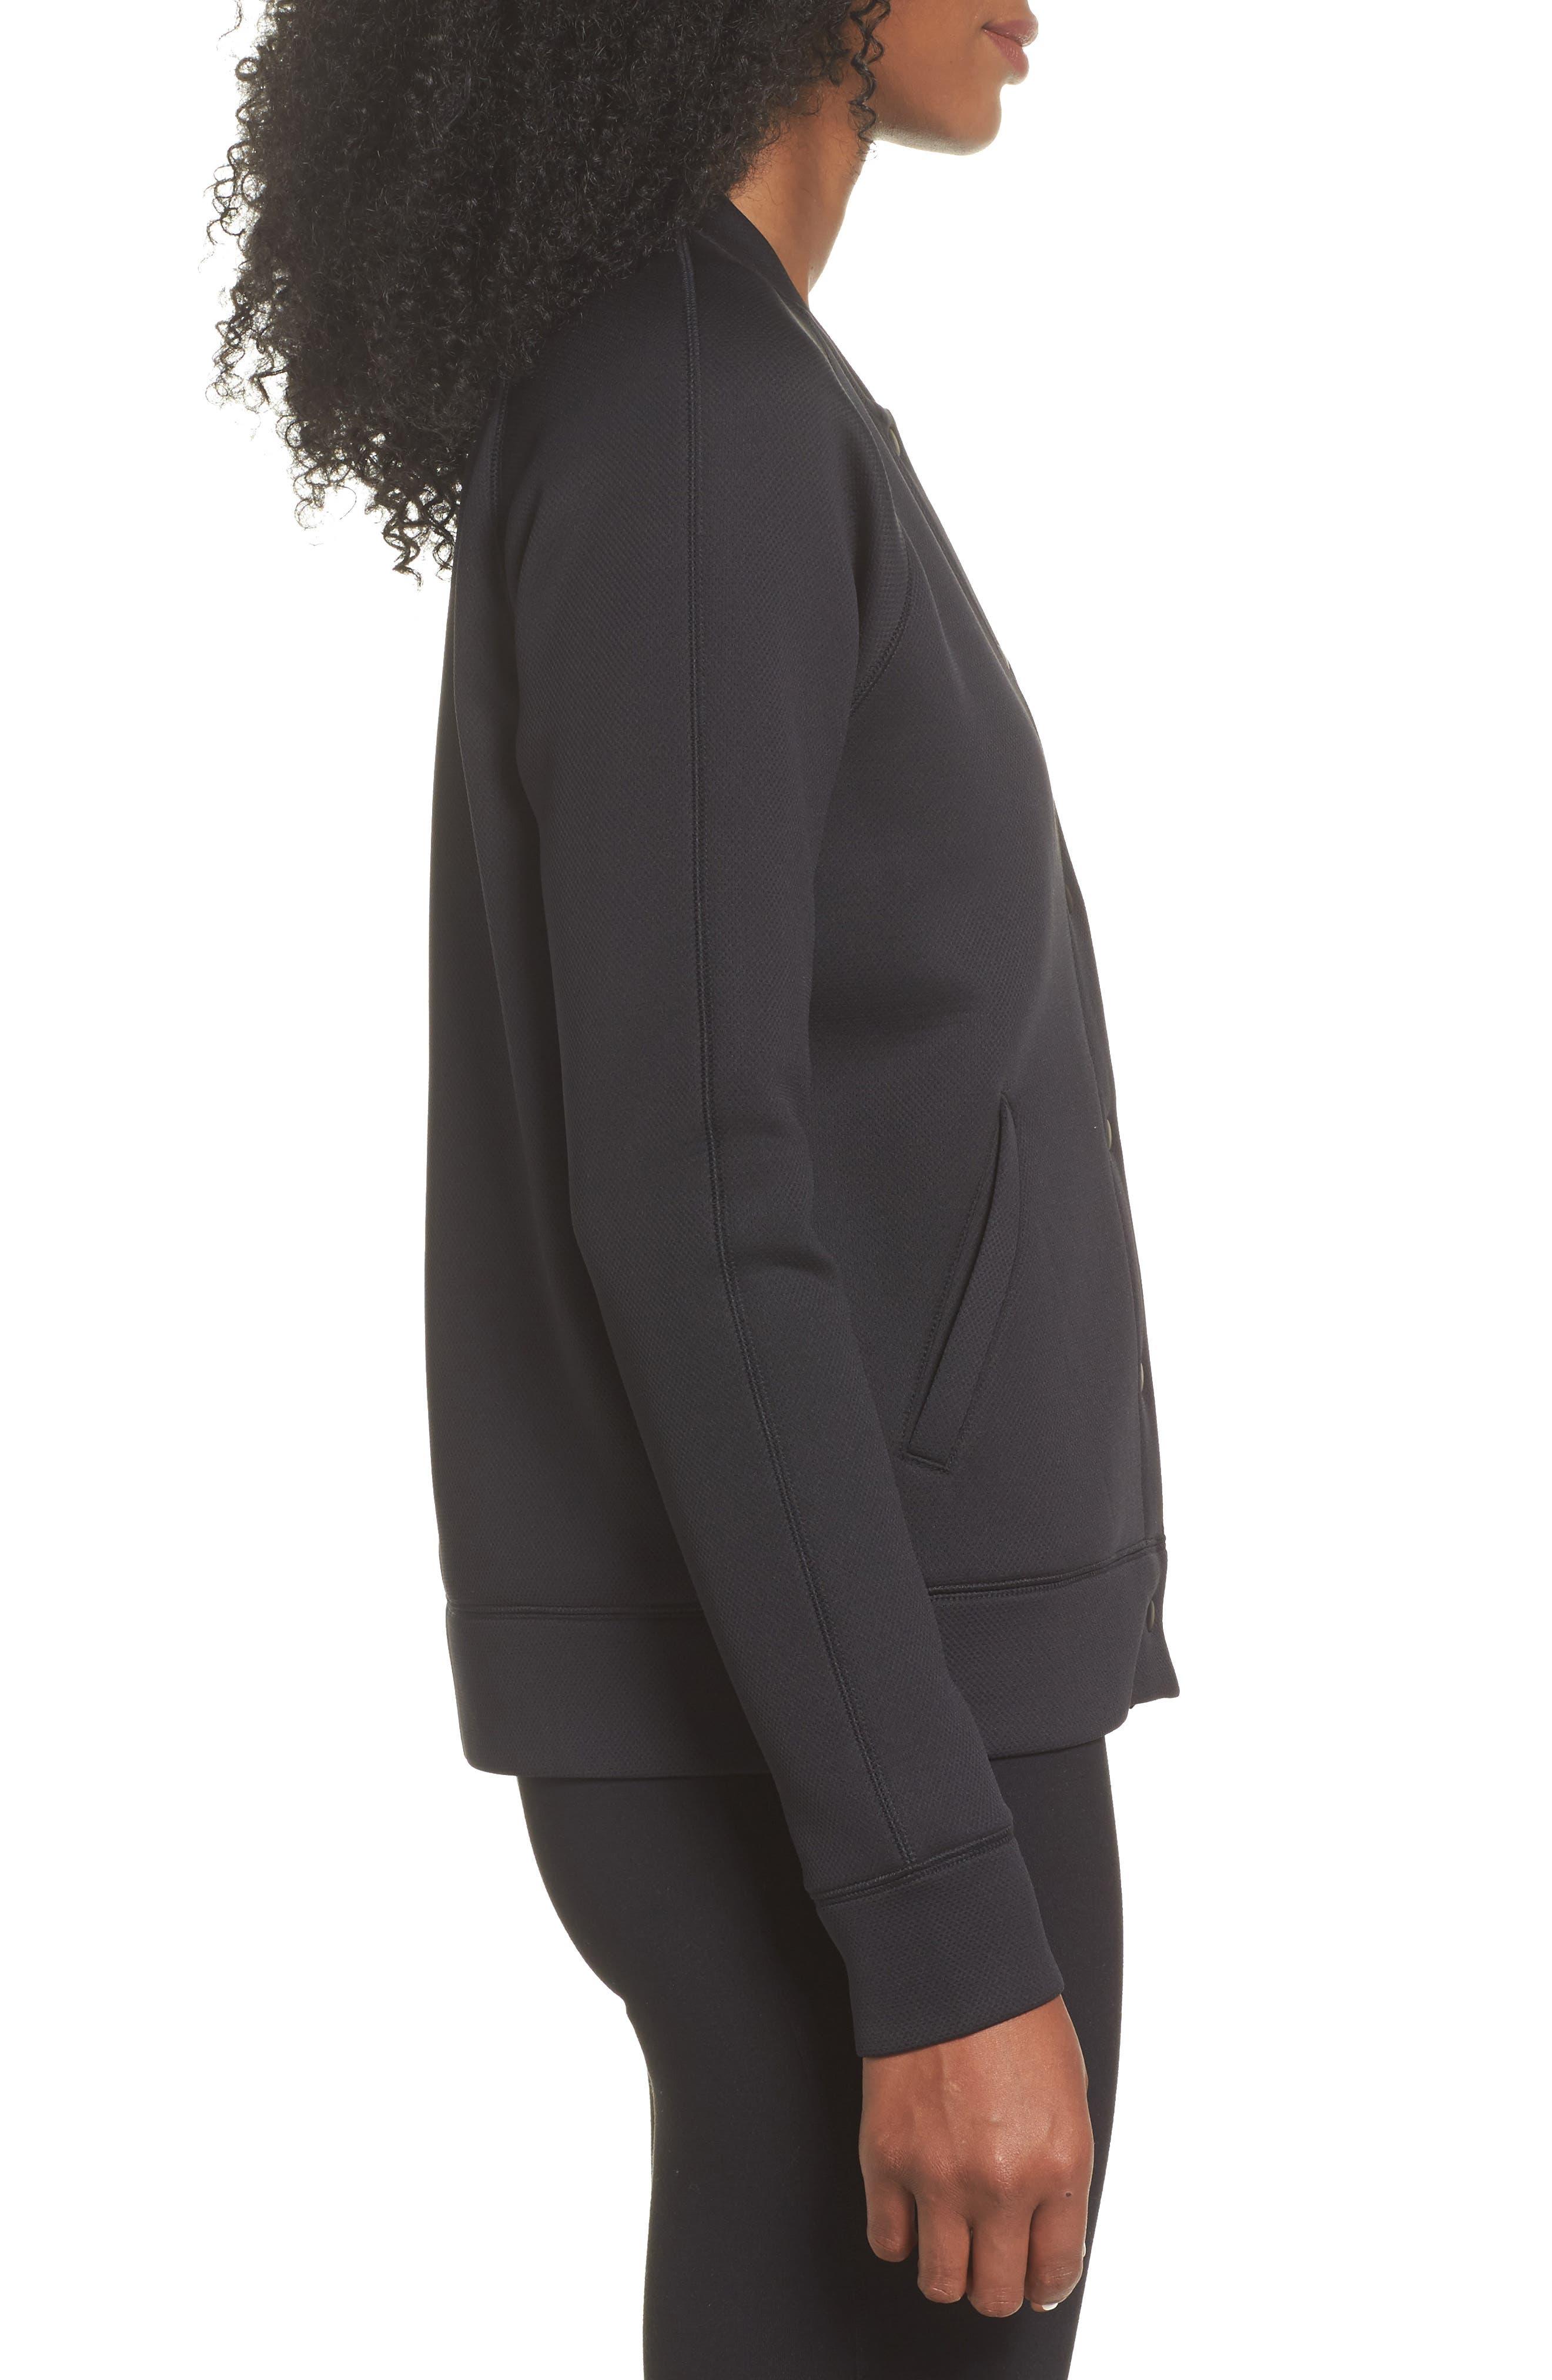 ZELLA, Arise Luxe Bomber Jacket, Alternate thumbnail 5, color, BLACK